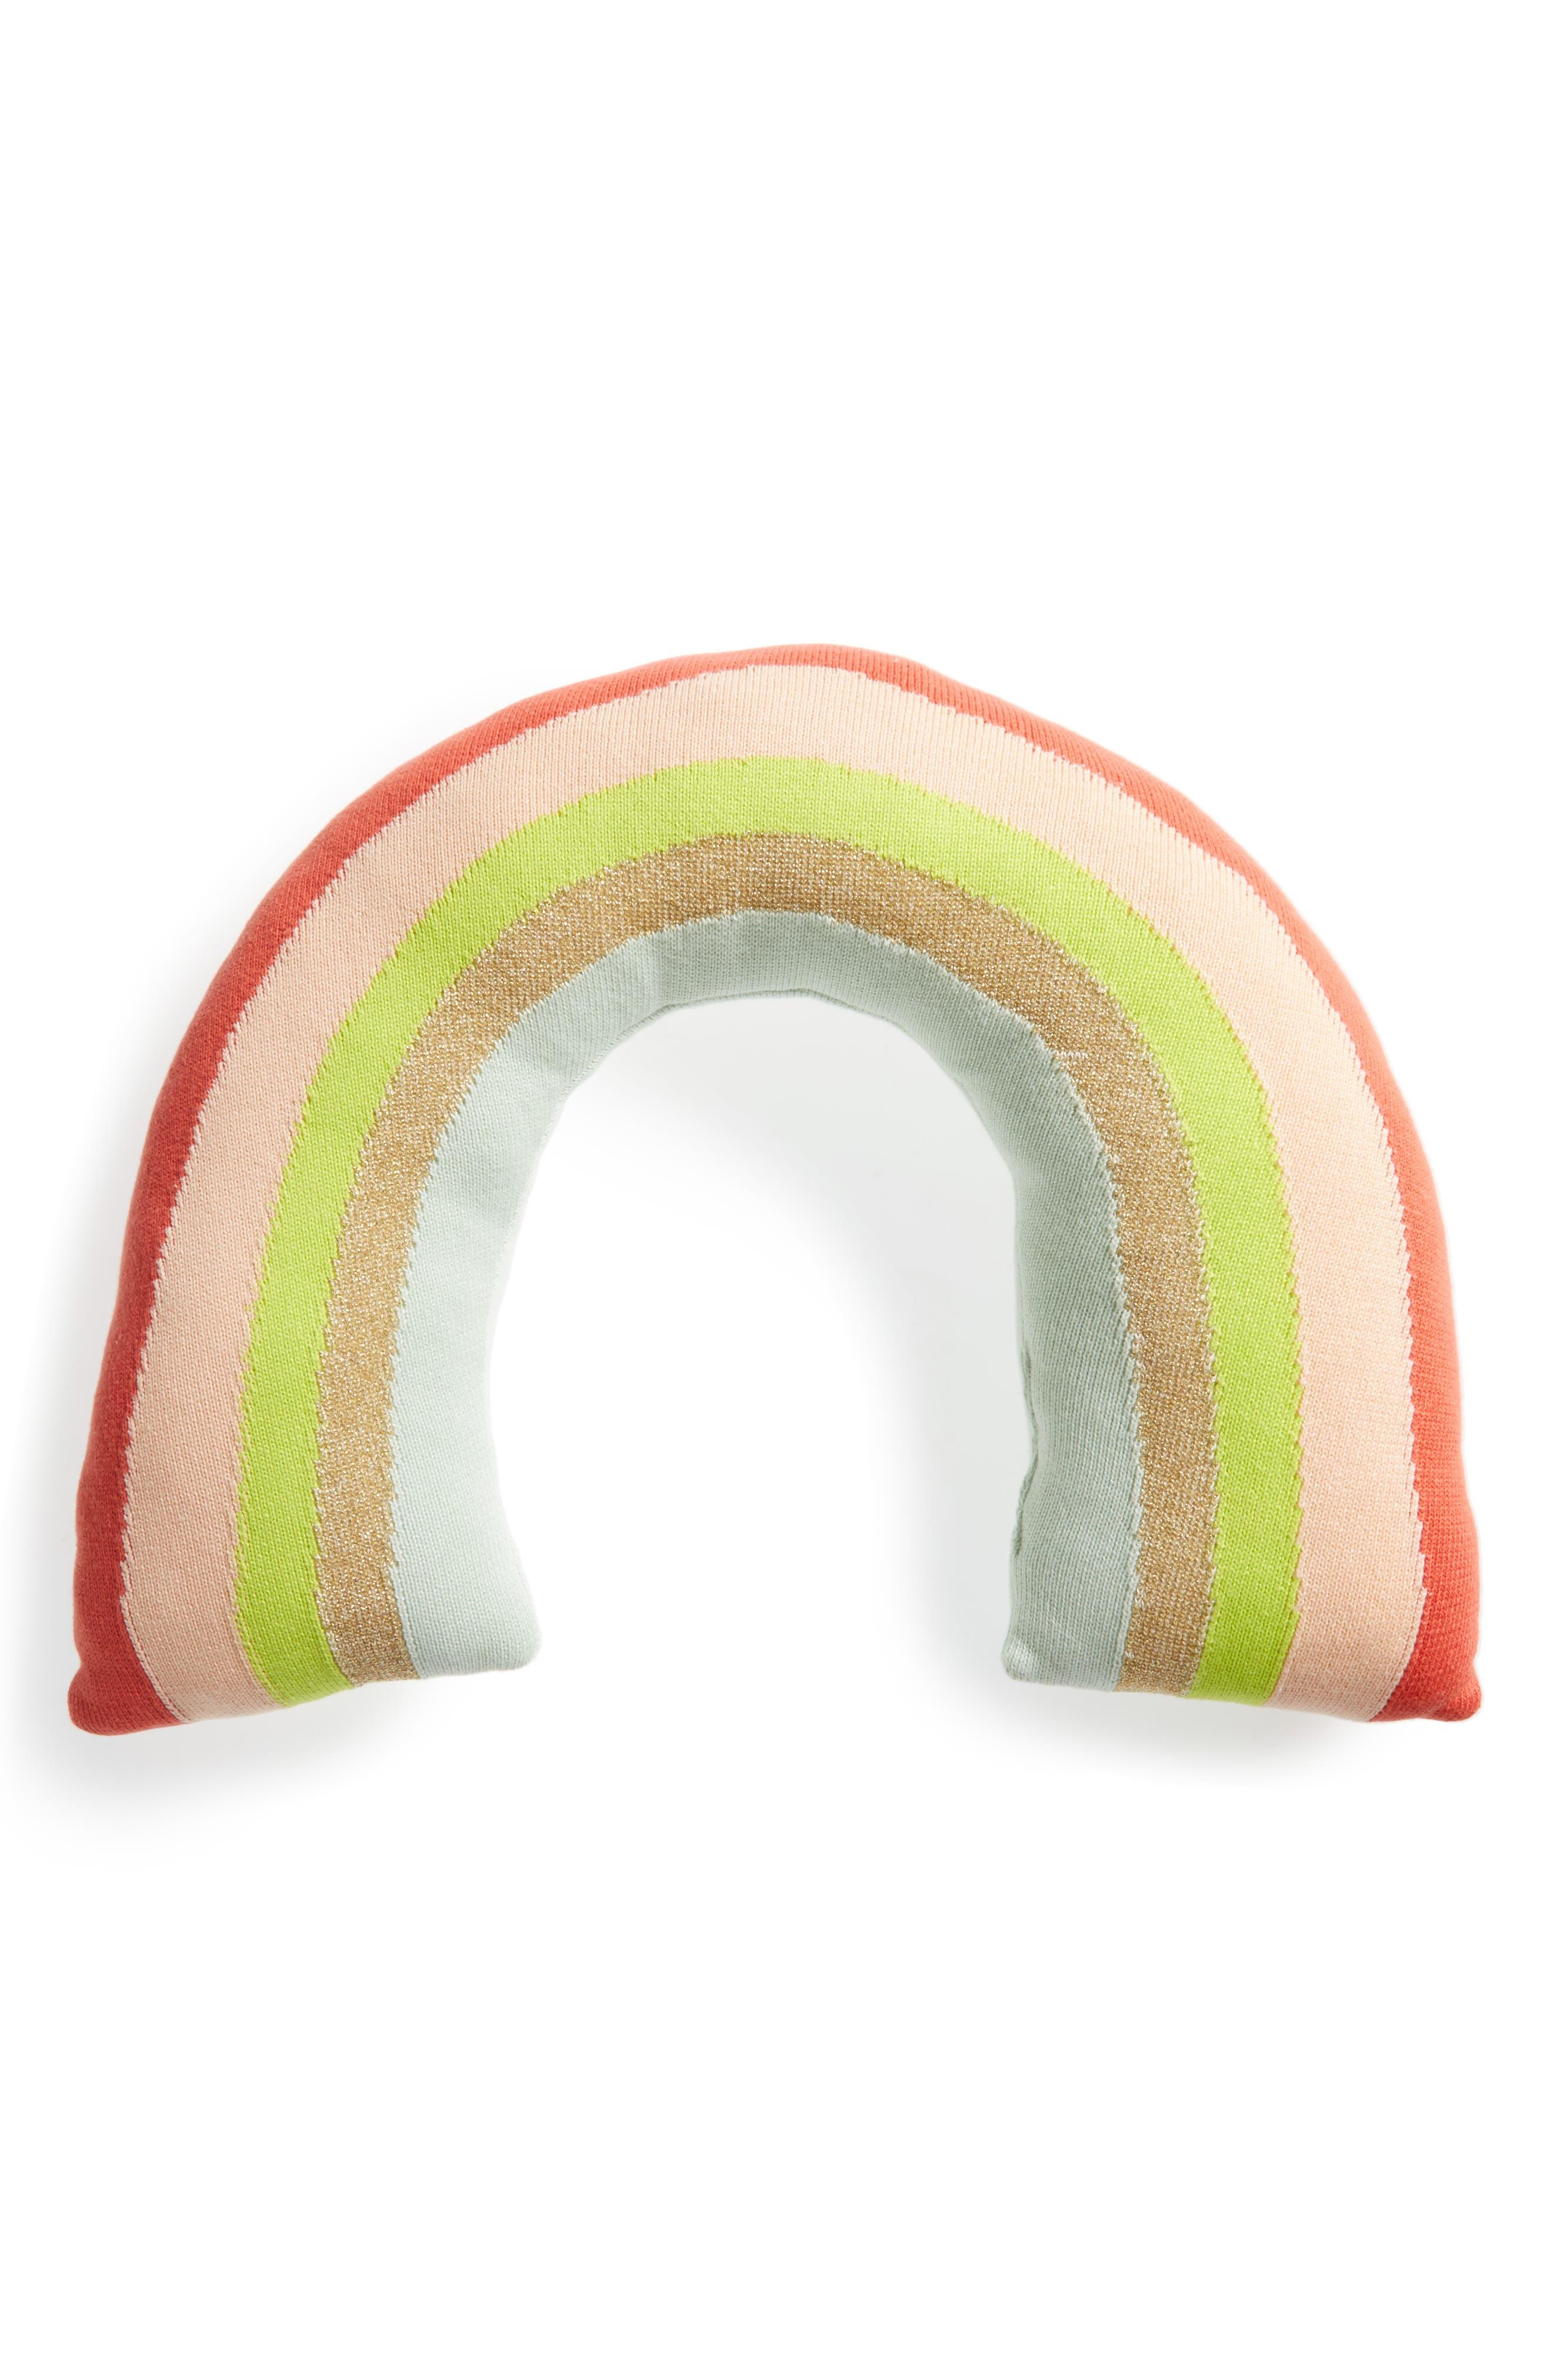 Alternate Image 1 Selected - Meri Meri Knit Organic Cotton Rainbow Cushion/Toy